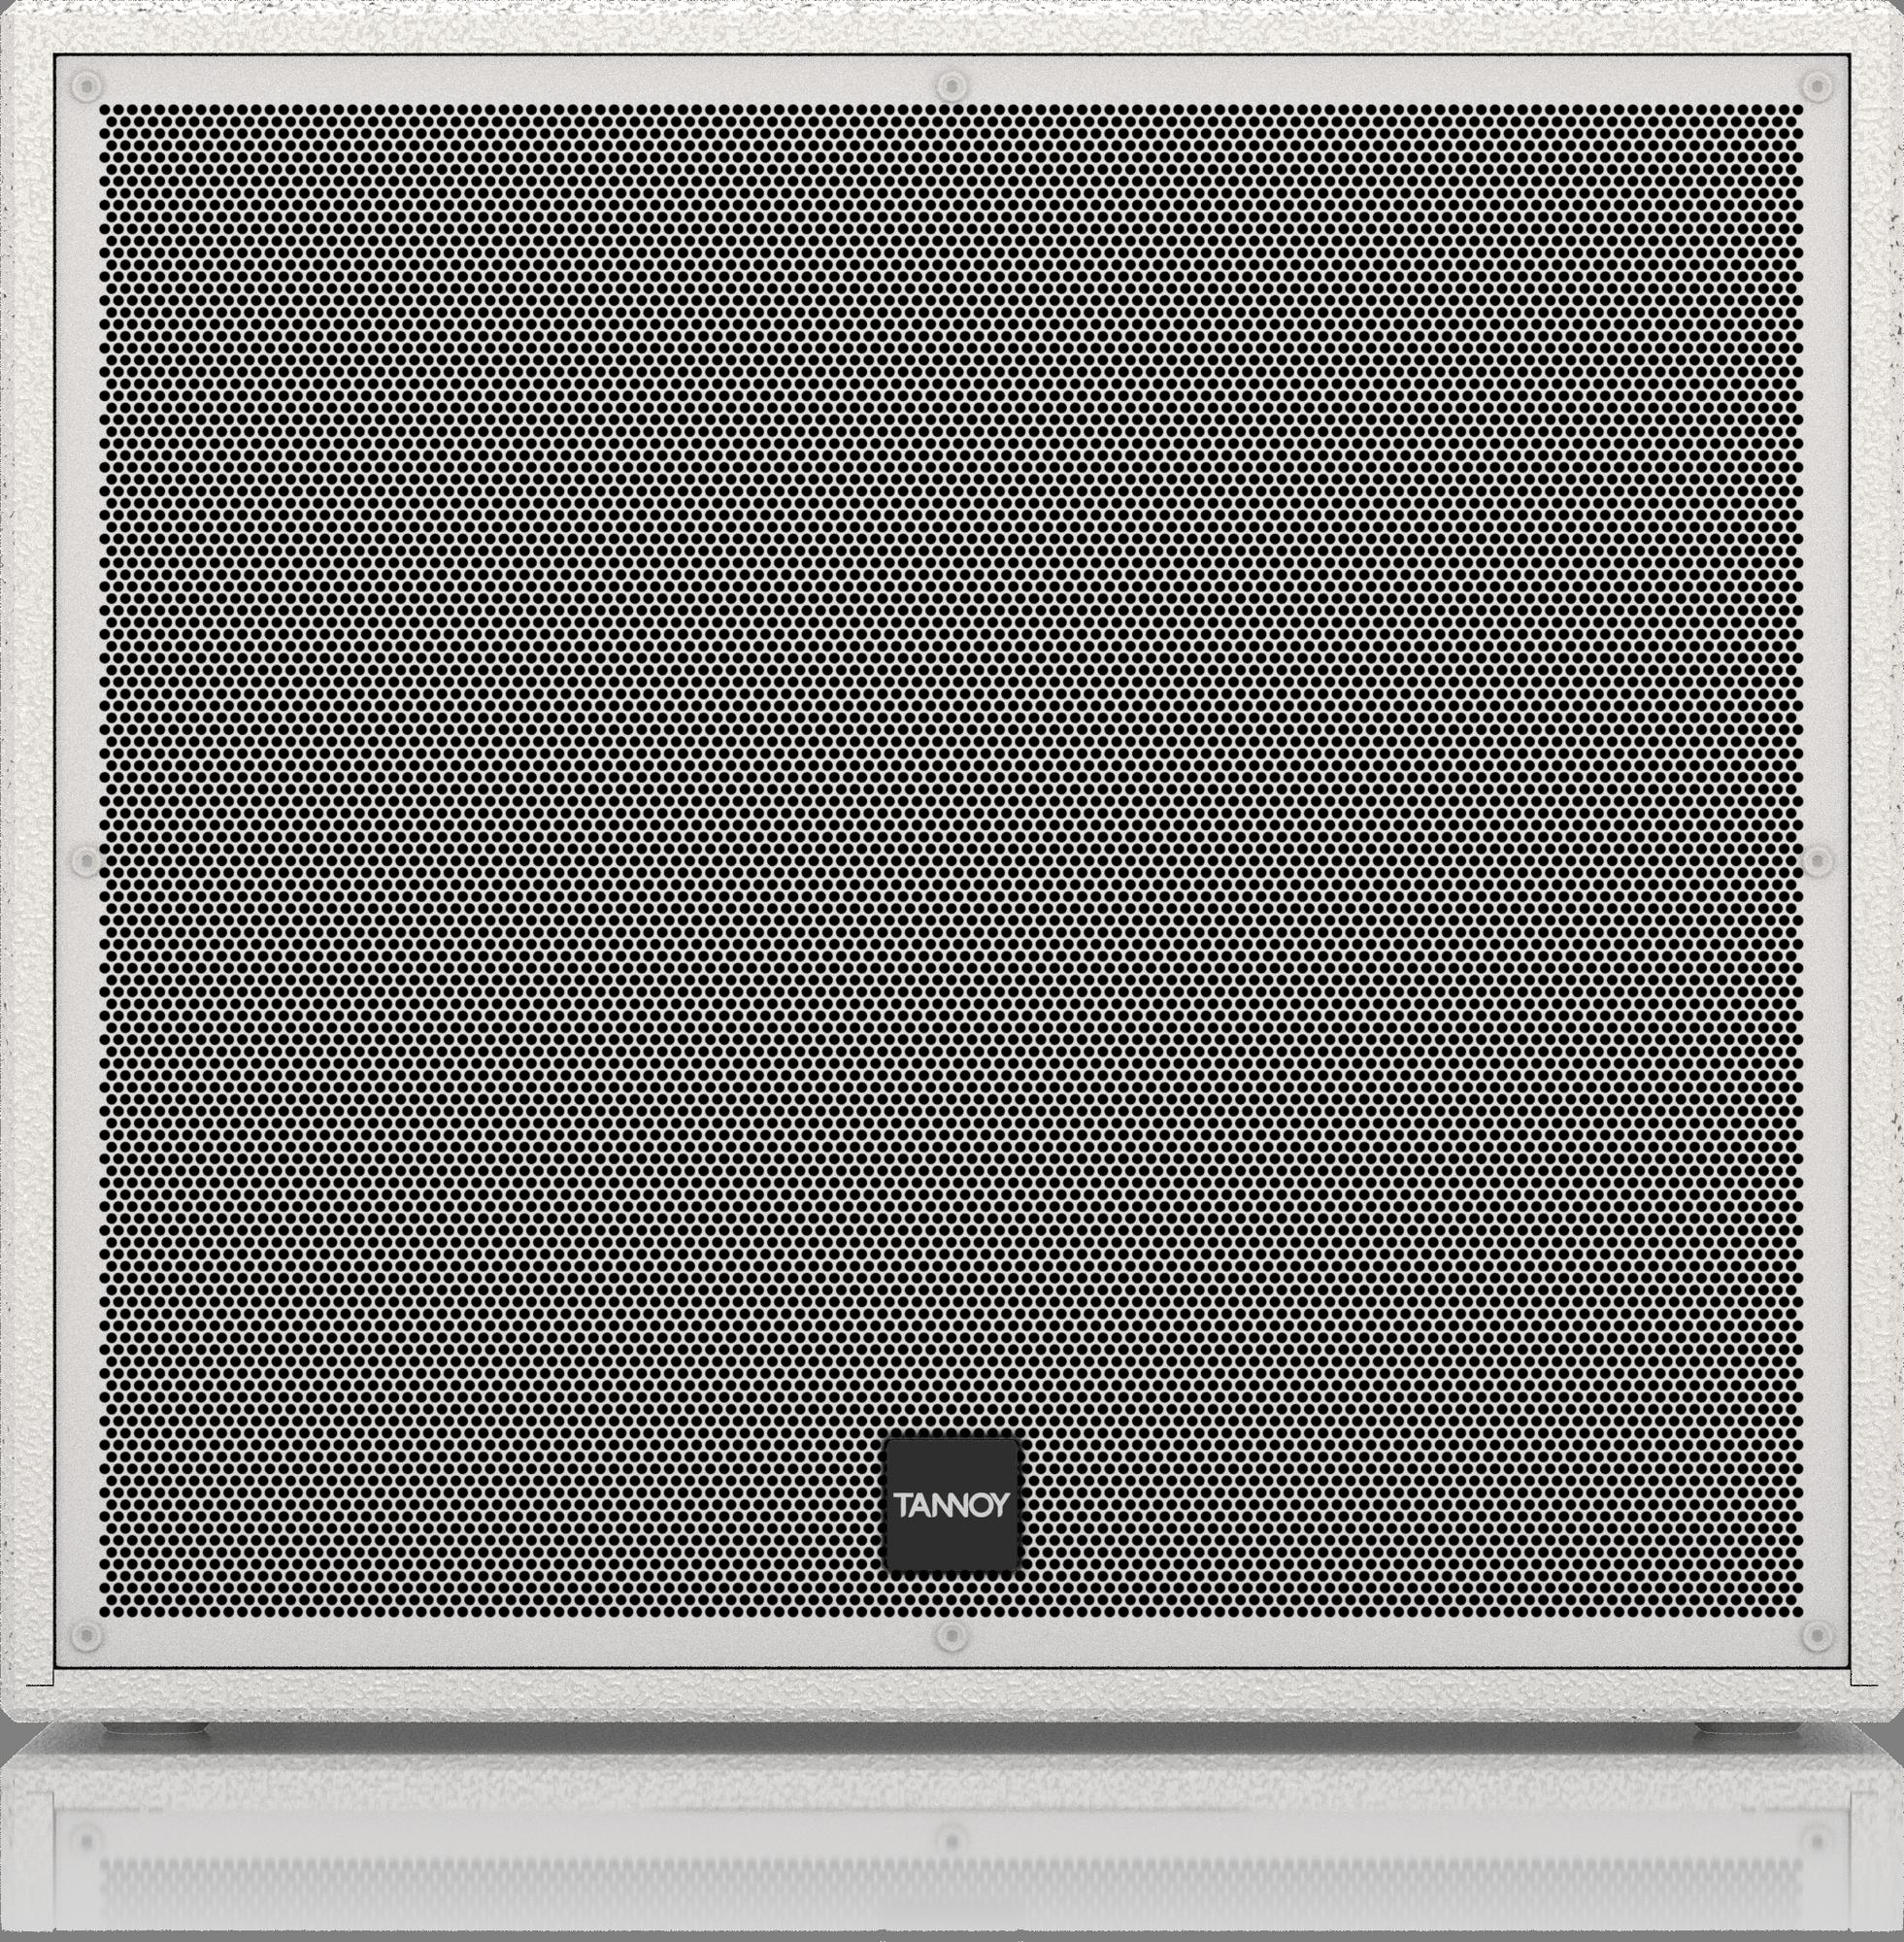 Tannoy  VSX118B-WH